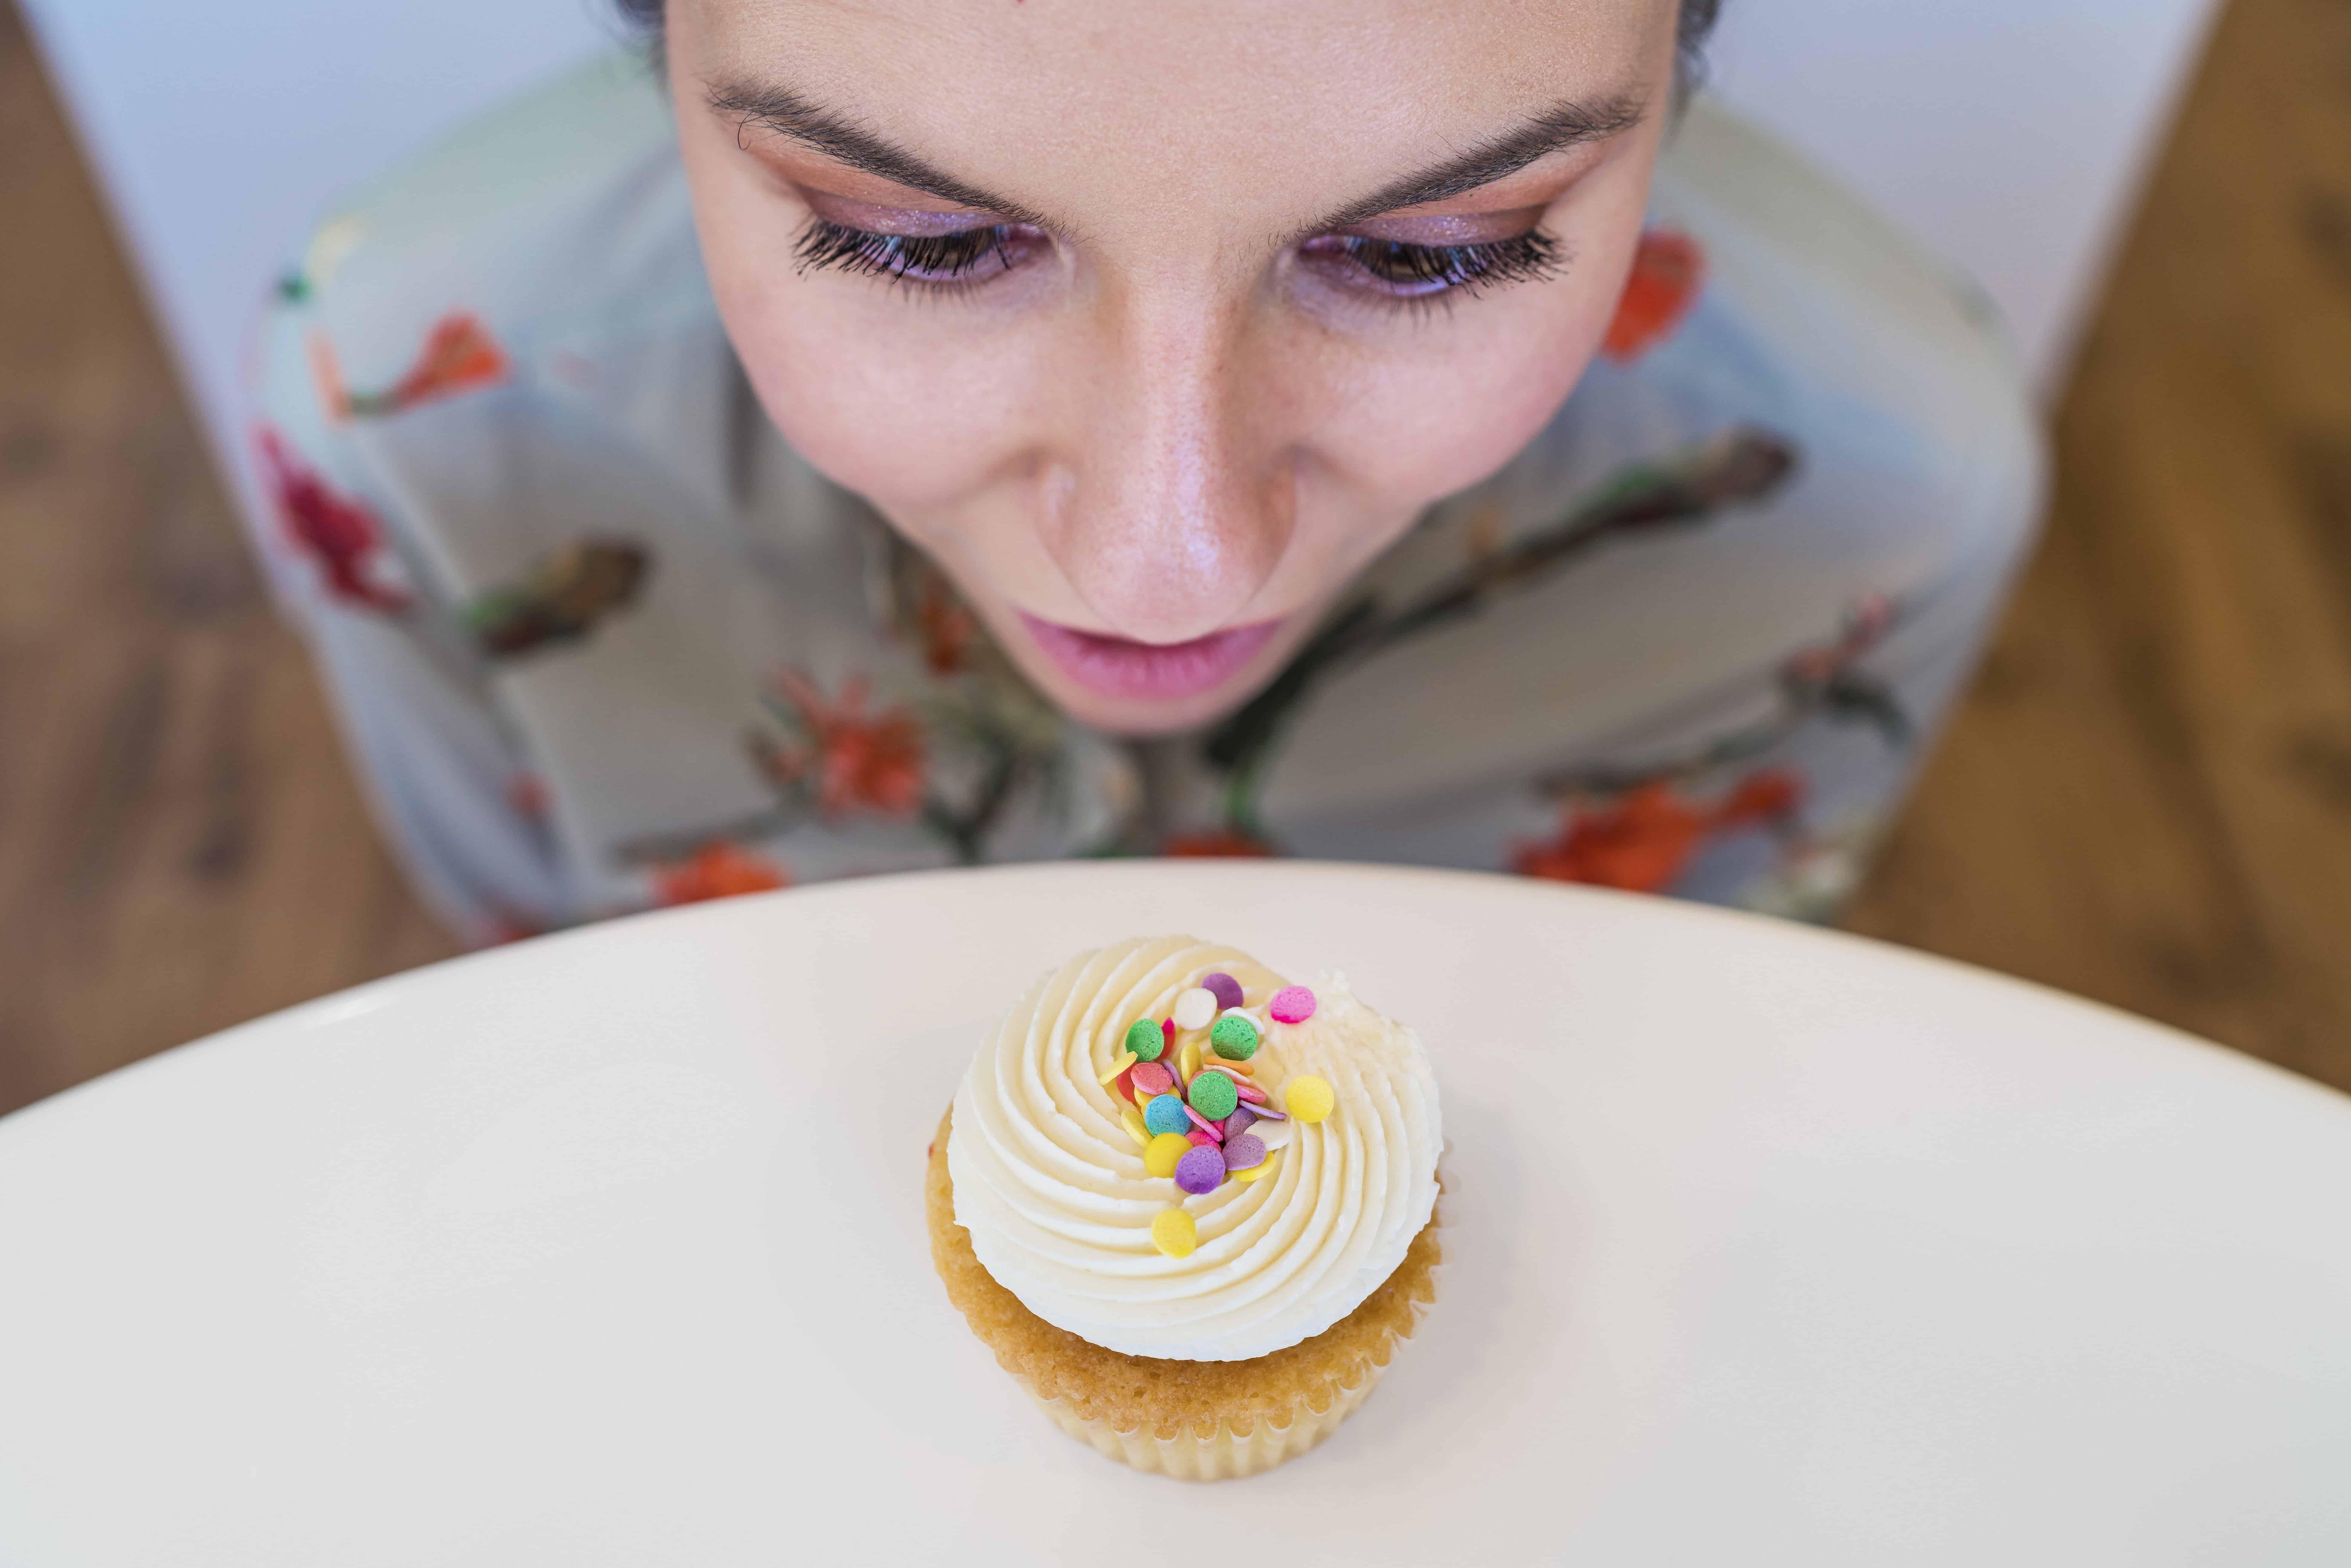 gratisography-woman-cupcake